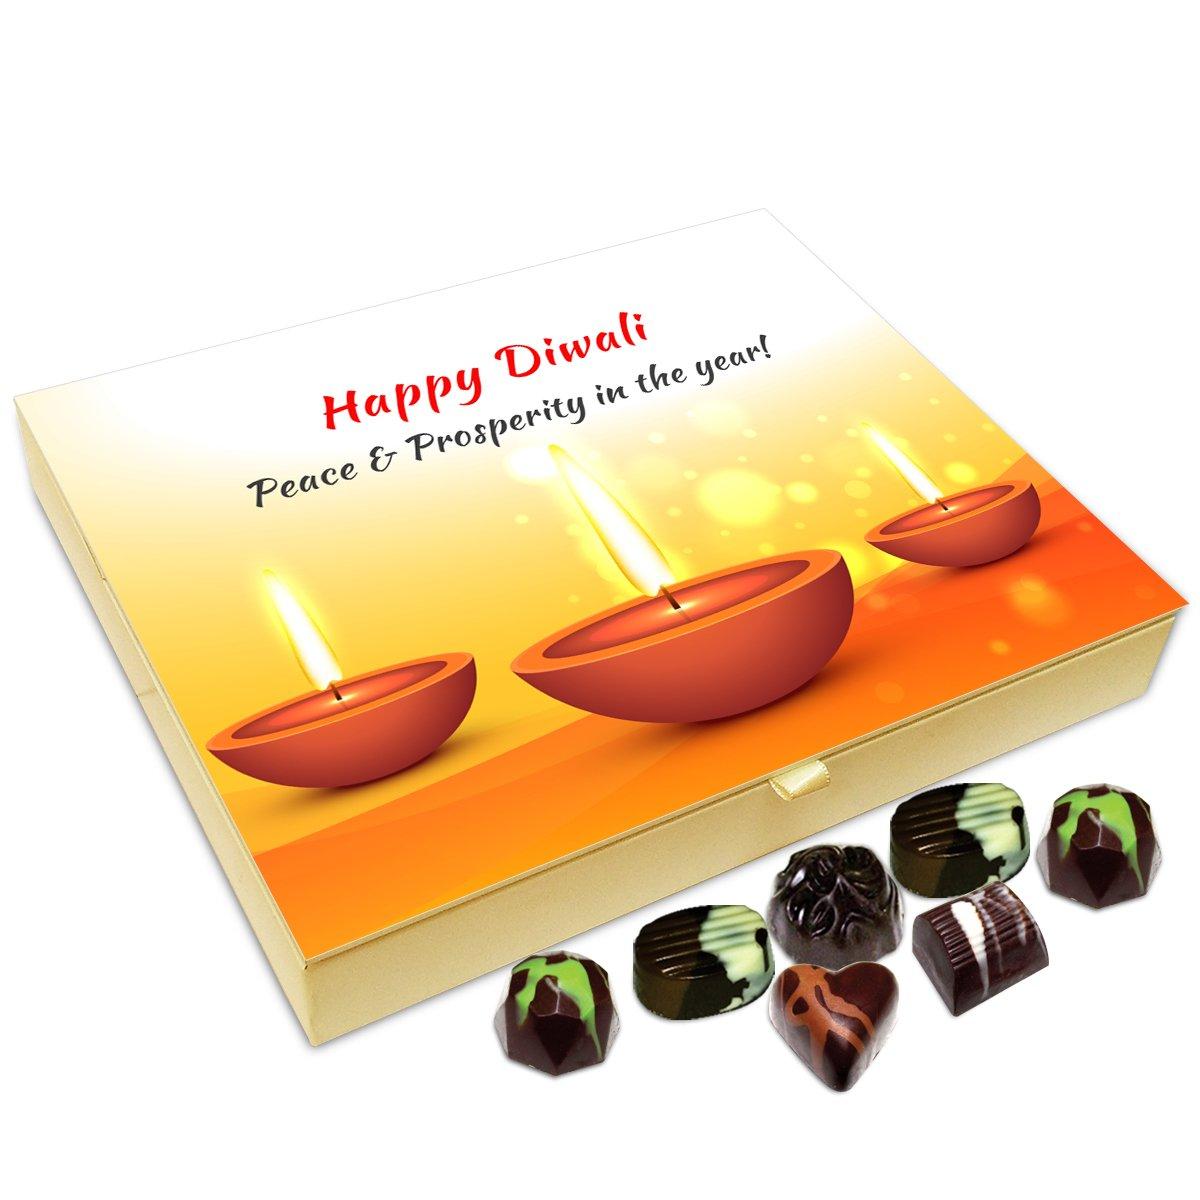 Chocholik Diwali Gift Box – Diwali is A Festival Full of Sweet Memories Chocolate Box – 20pc